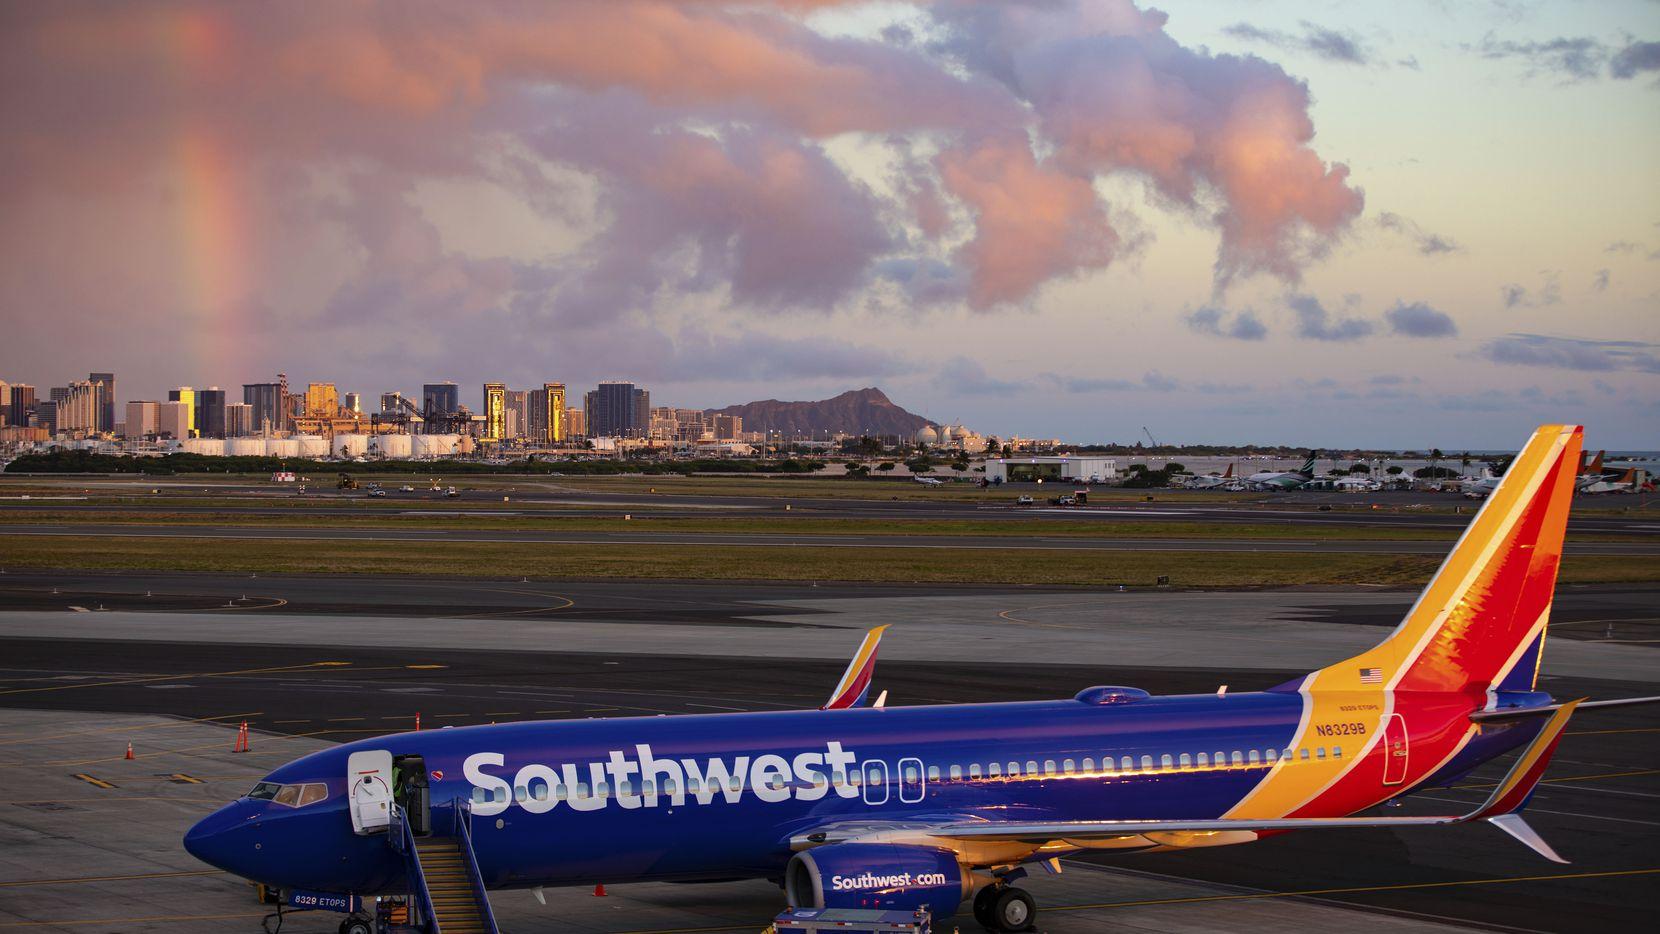 Southwest Airlines' first-ever flight to the Hawaiian Islands, aboard a Boeing 737-800, is shown on Feb. 5, 2019 at Daniel K. Inouye International Airport, in Honolulu, HI.